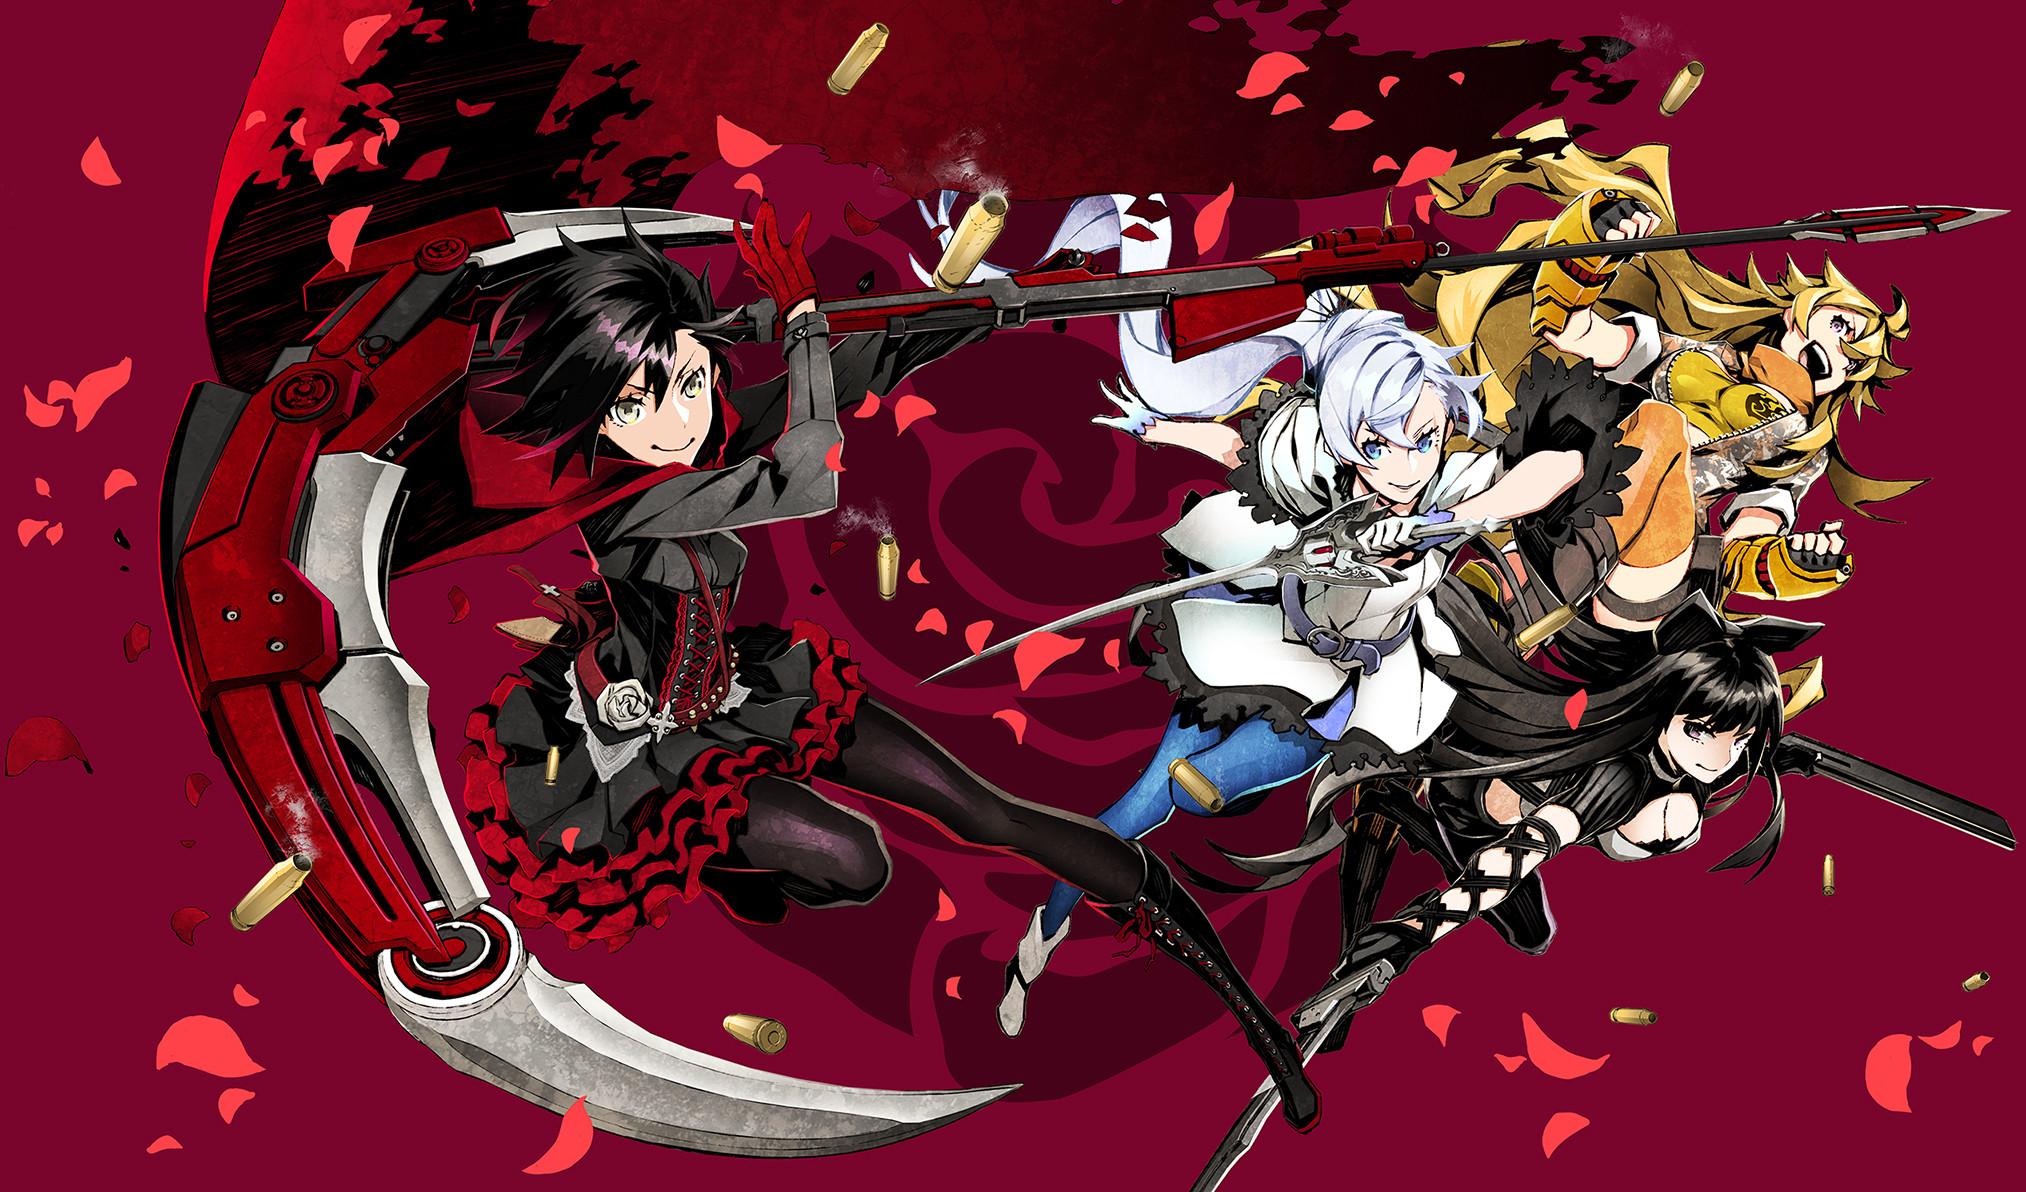 Anime Girl Epic Wallpapers Rwby Yang Wallpaper 70 Images